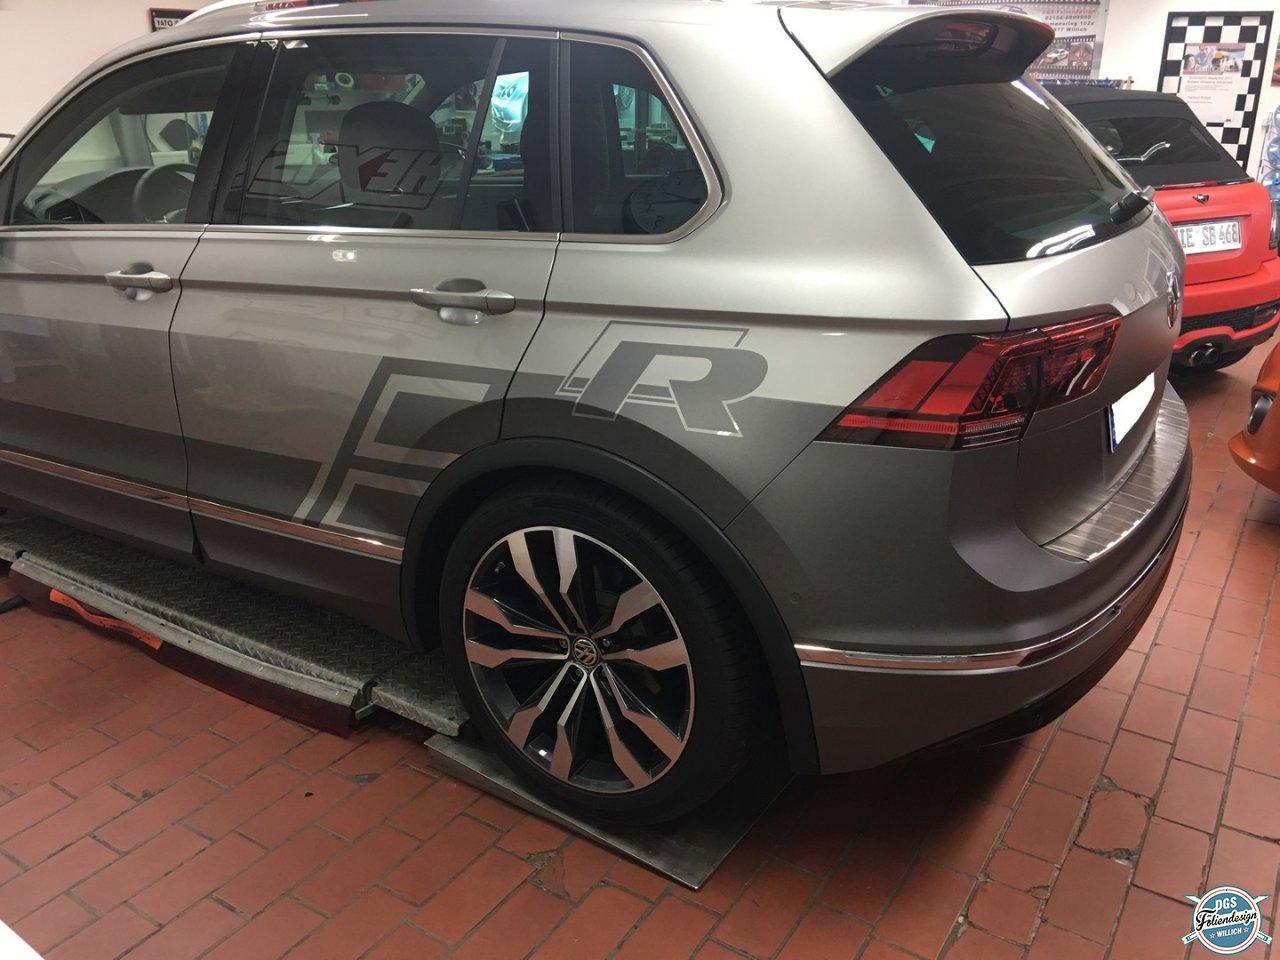 Teilfolierung - VW Tiguan R Line - DGS-Wrapping & Foliendesign